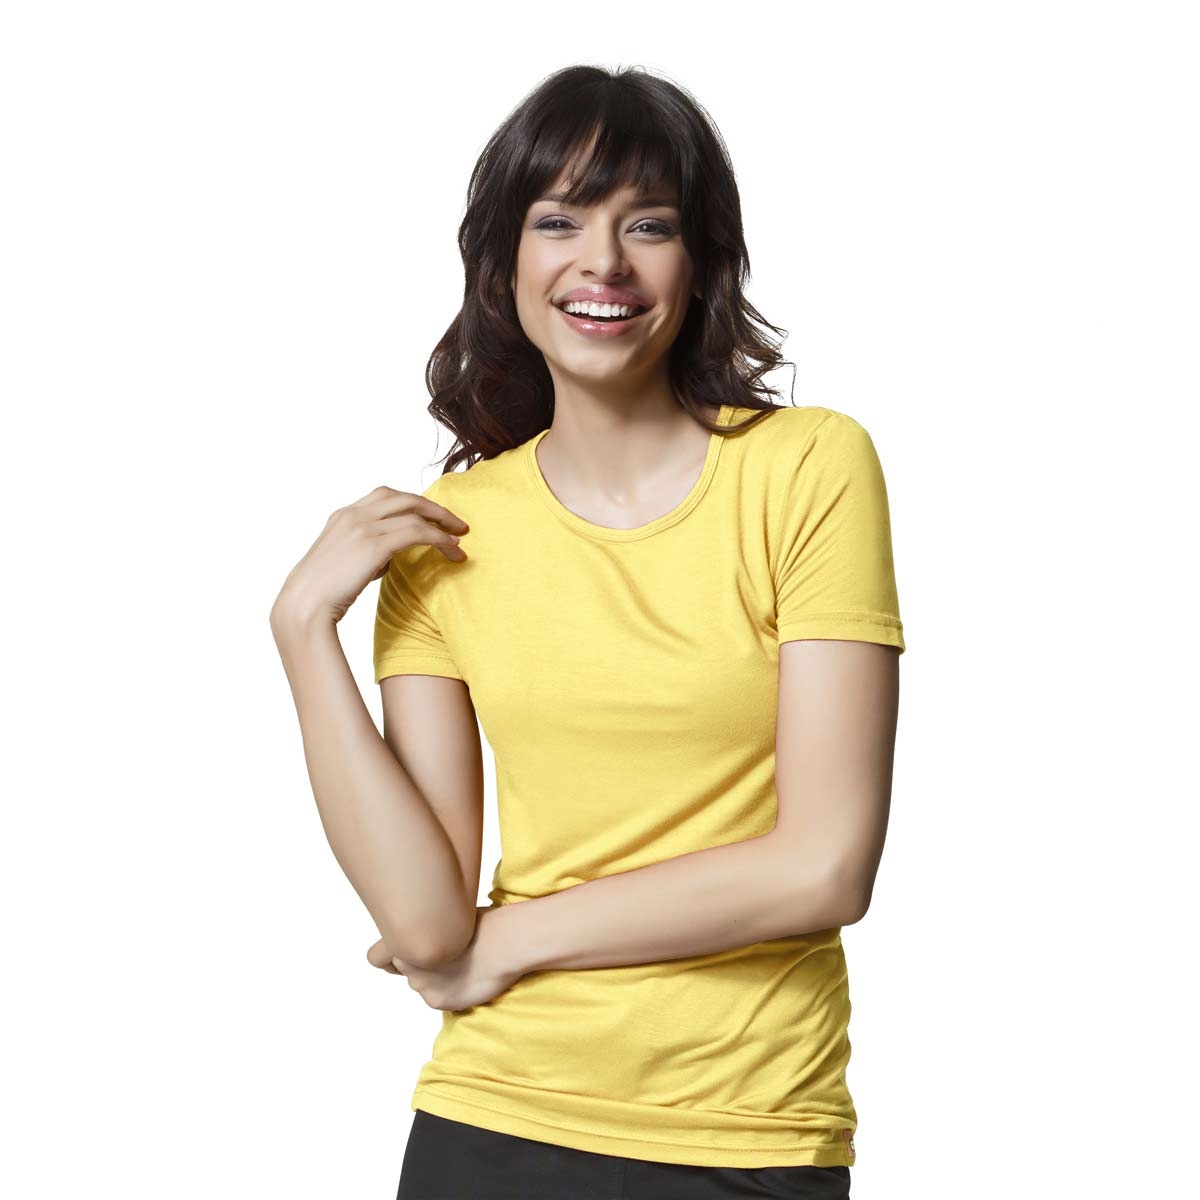 2604975b Keep Warm With The Slinky Knit Short Sleeve Tee Shirt - WonderWink ...